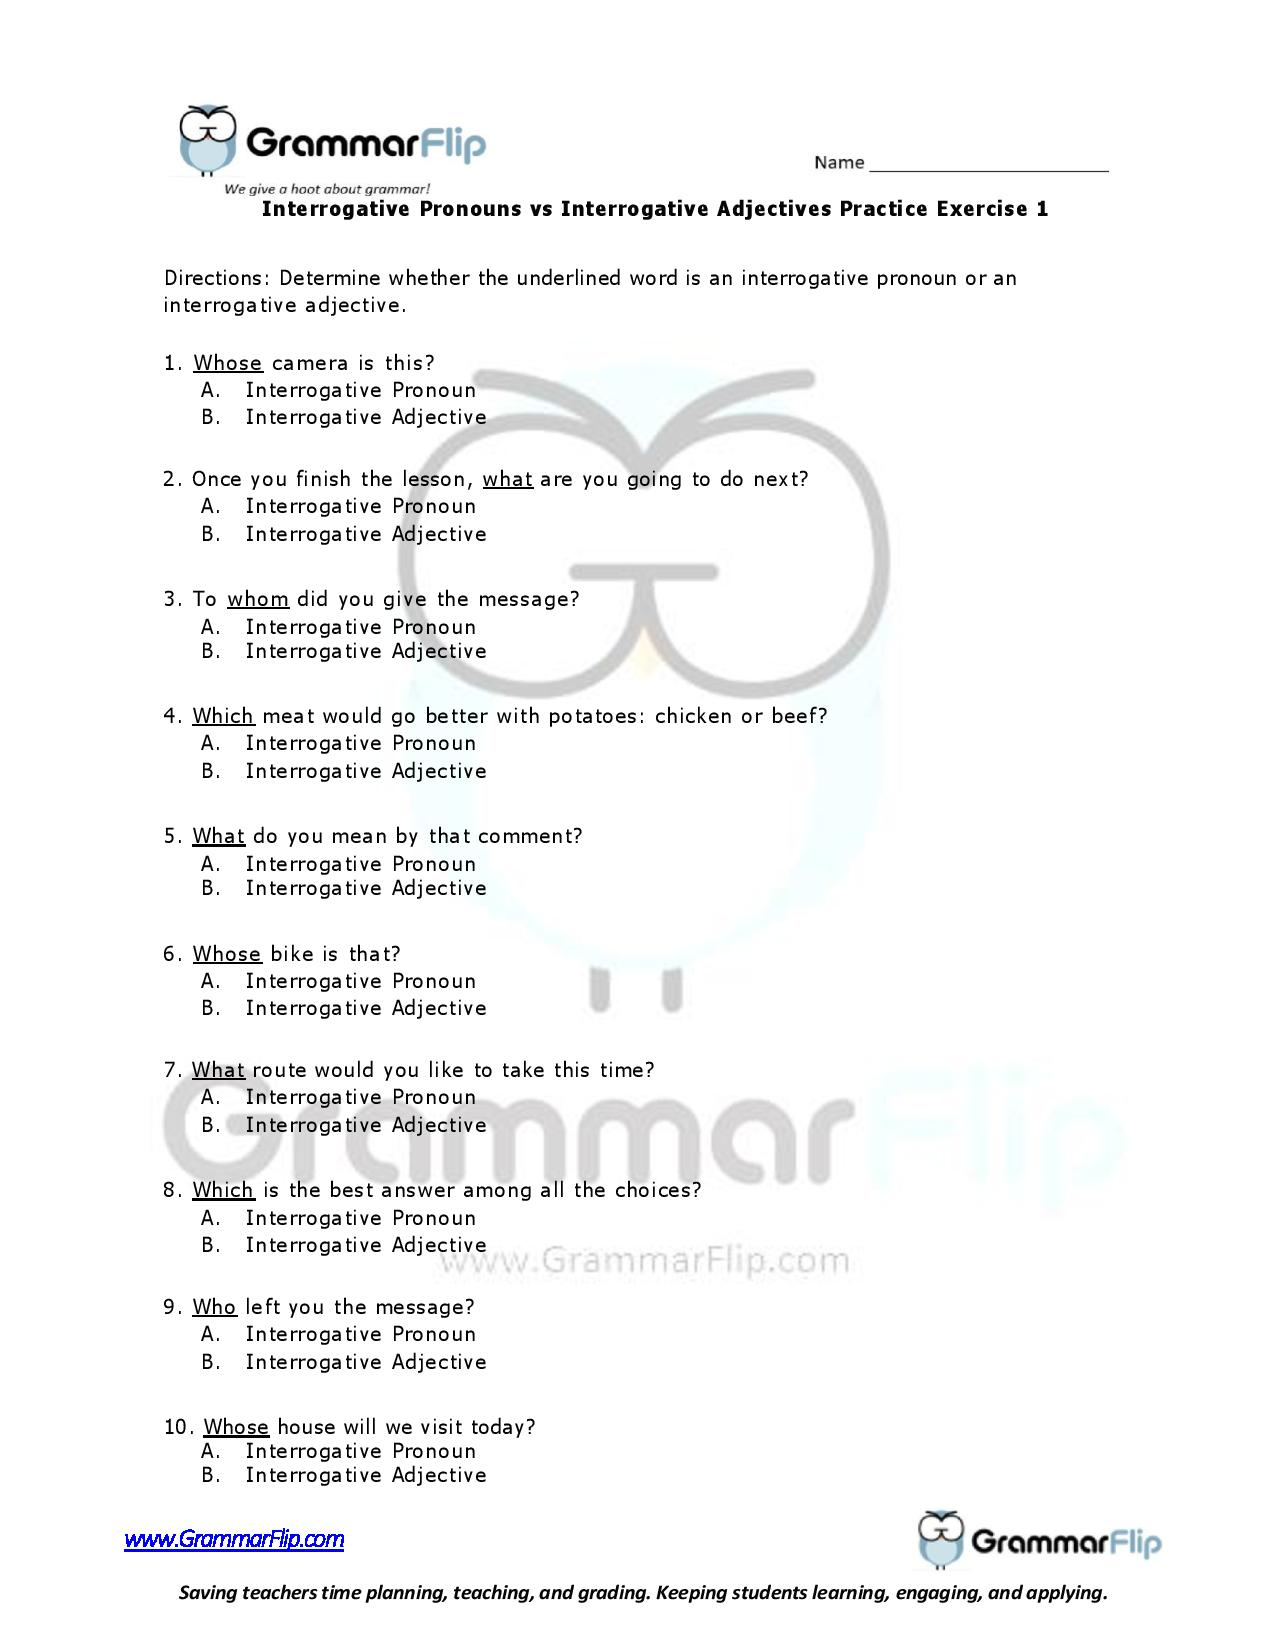 Interrogative Pronouns Vs Interrogative Adjectives